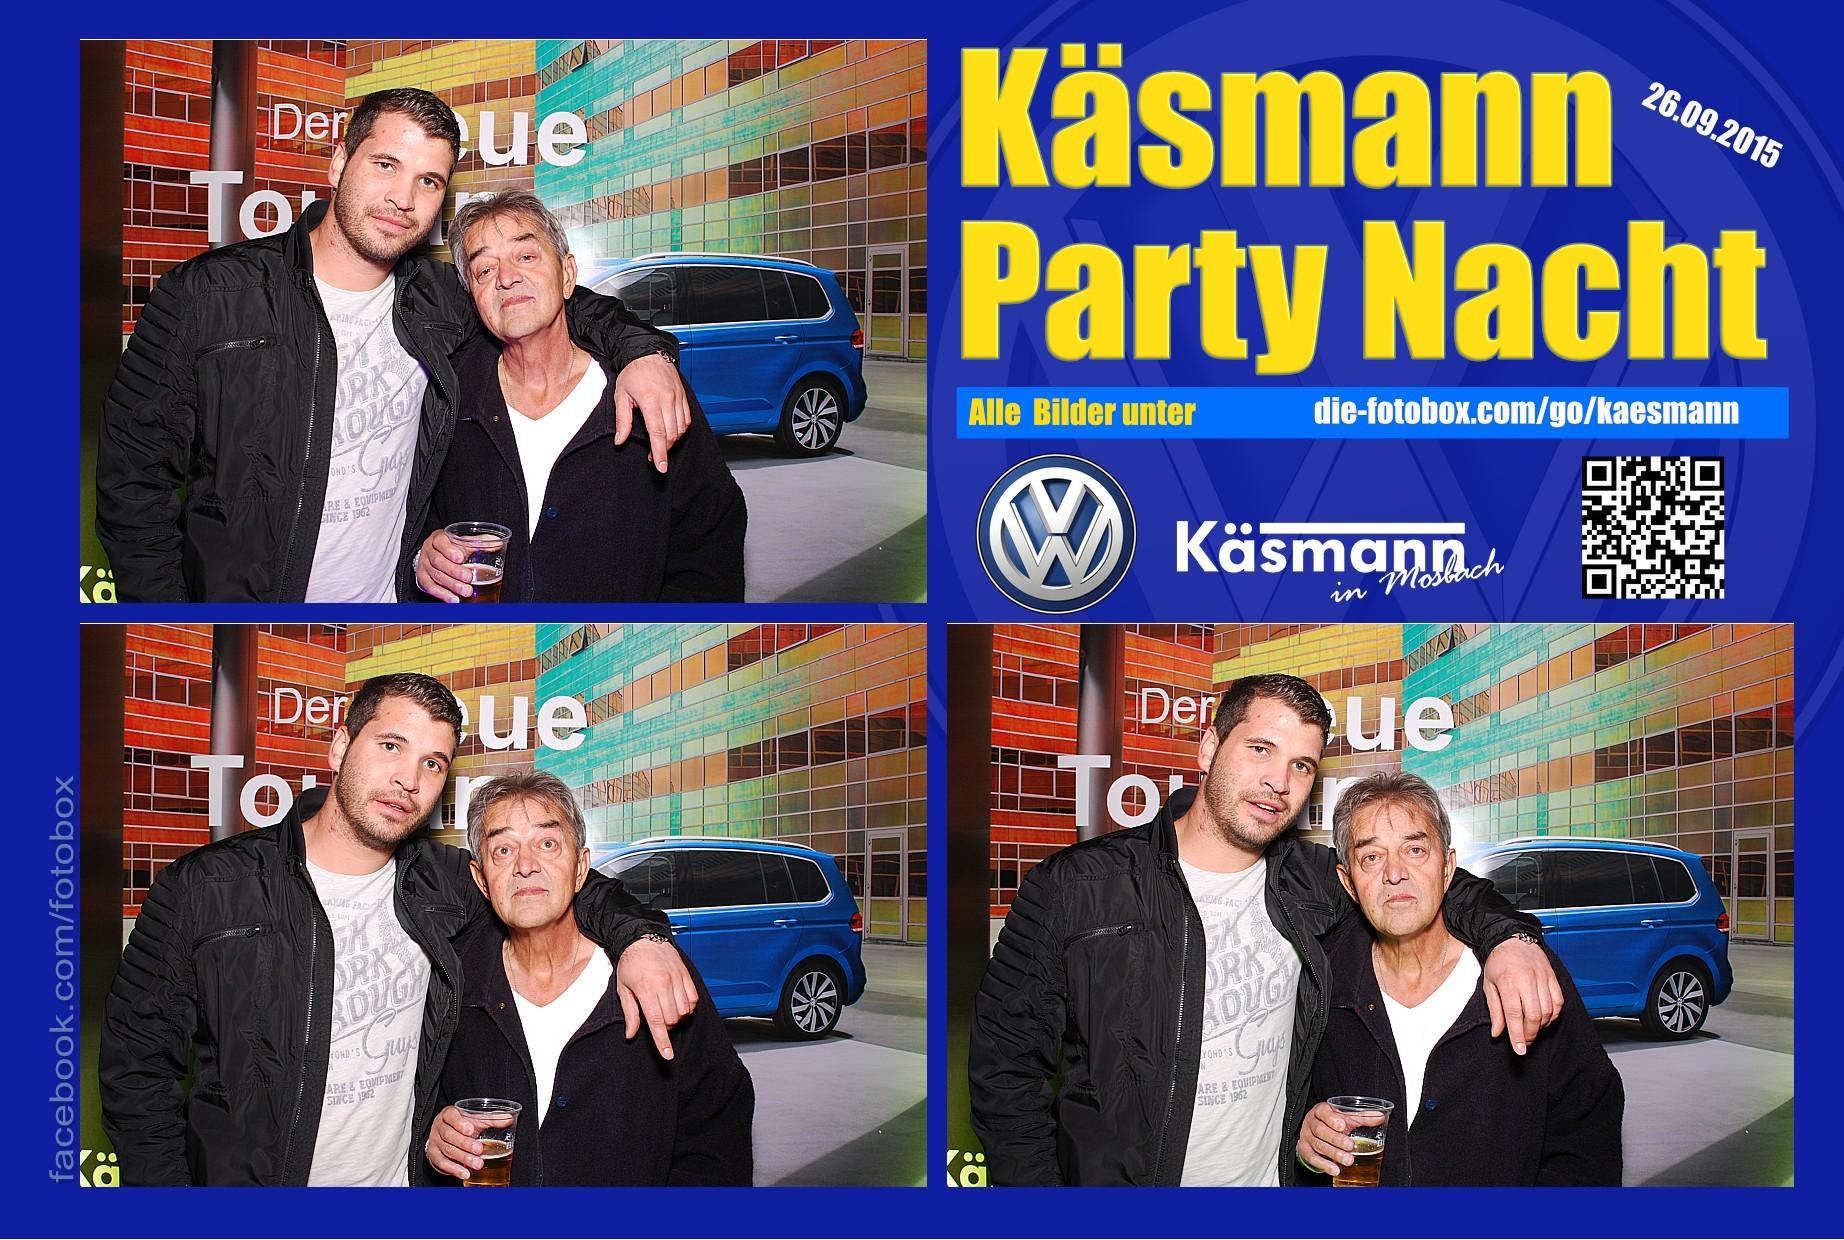 Käsmannparty 2015 - www.die-fotobox.com 01284